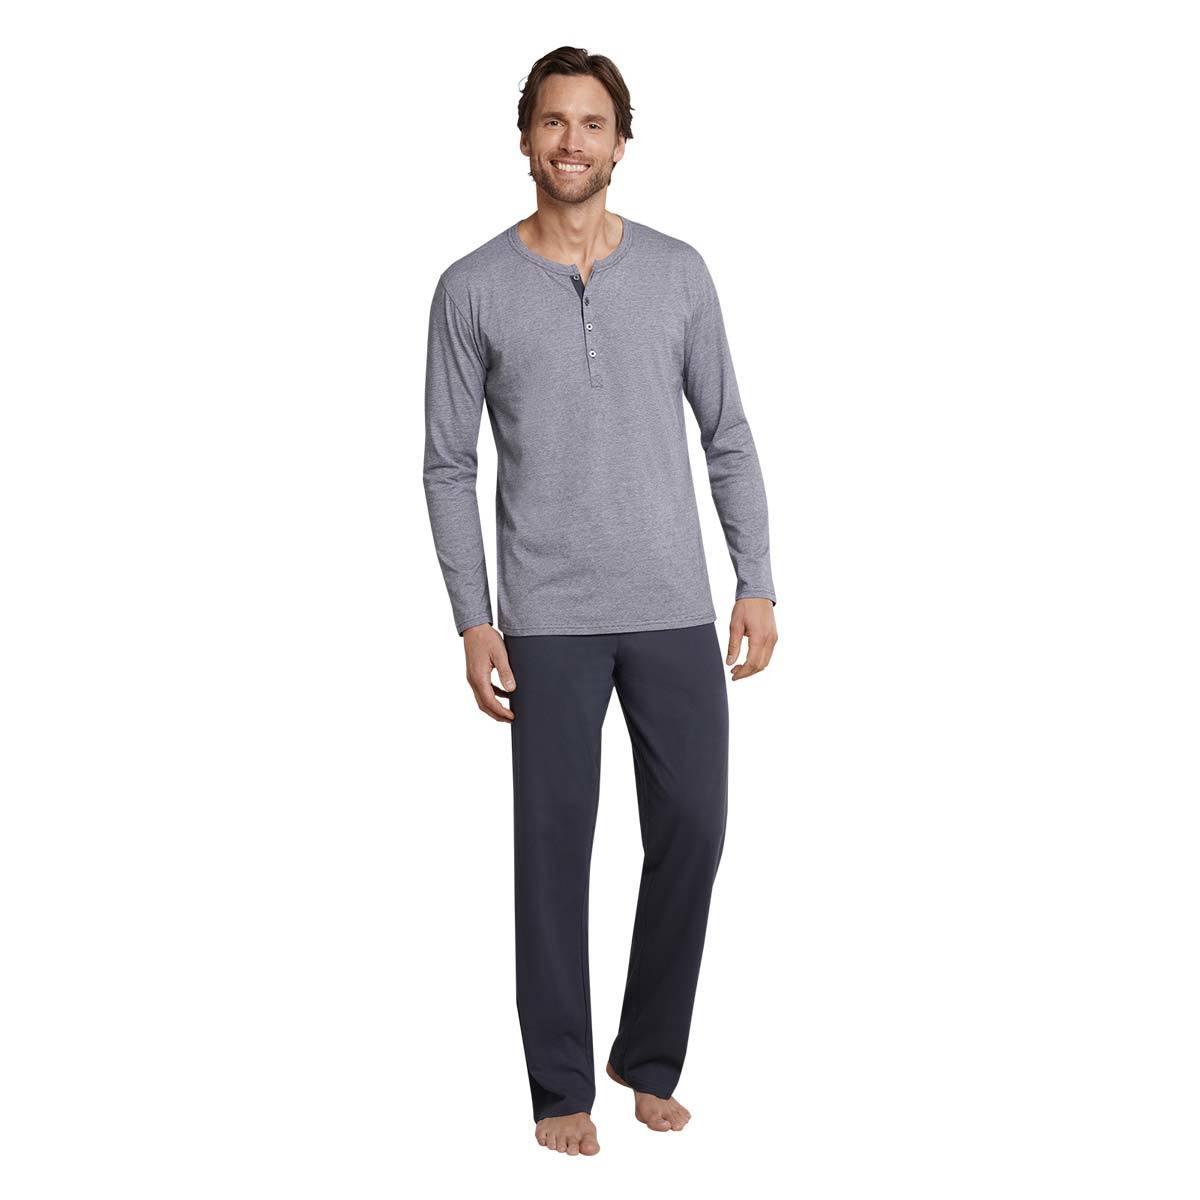 promo code fe23c 39e02 Schiesser Schlafanzug Herren Pyjama lang anthrazit